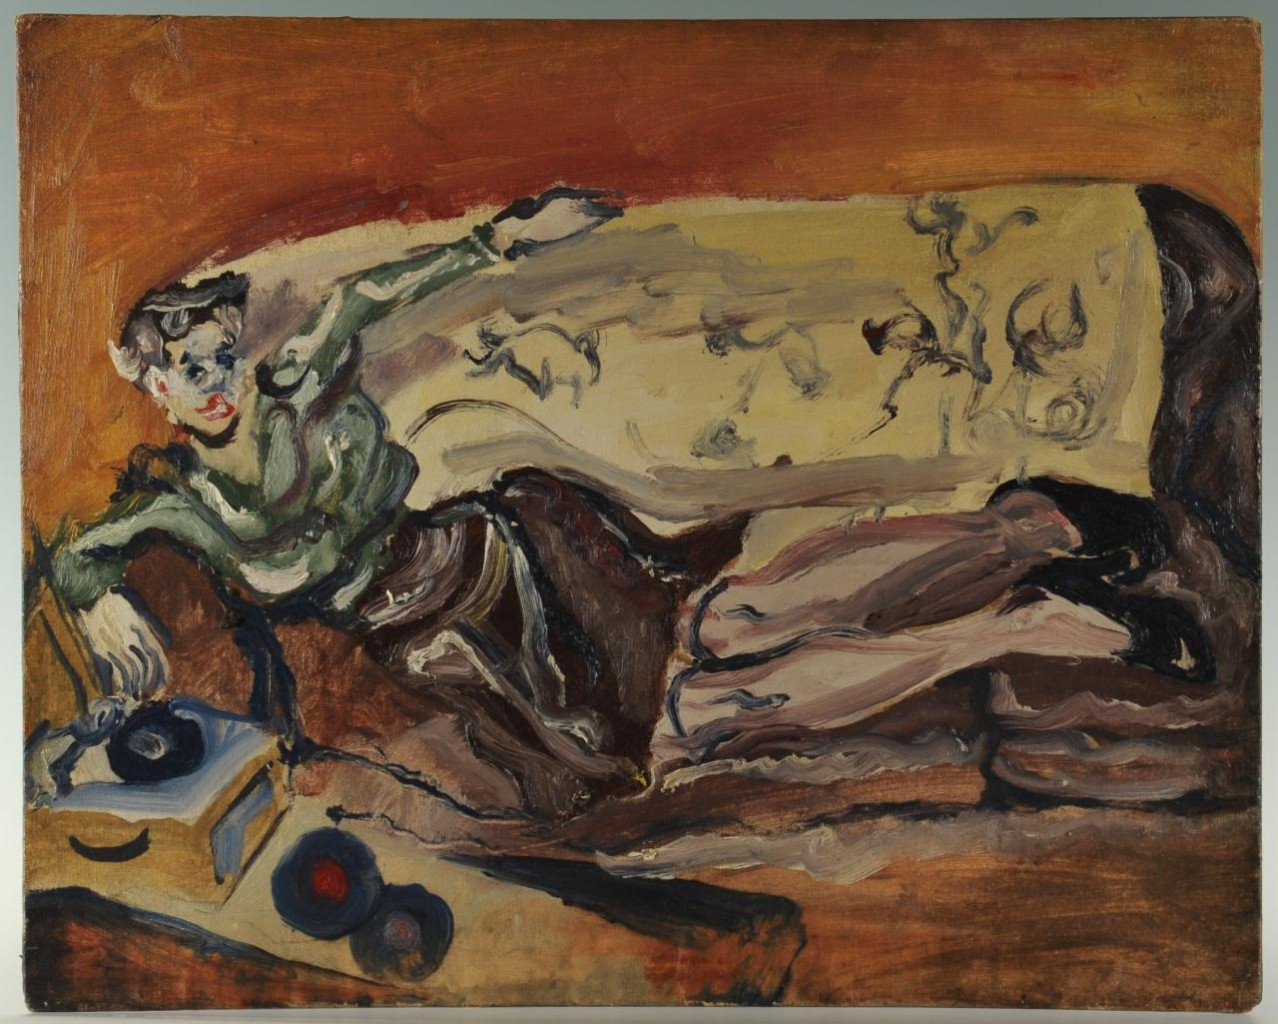 Lot 181: Joseph Delaney, Lounging Woman